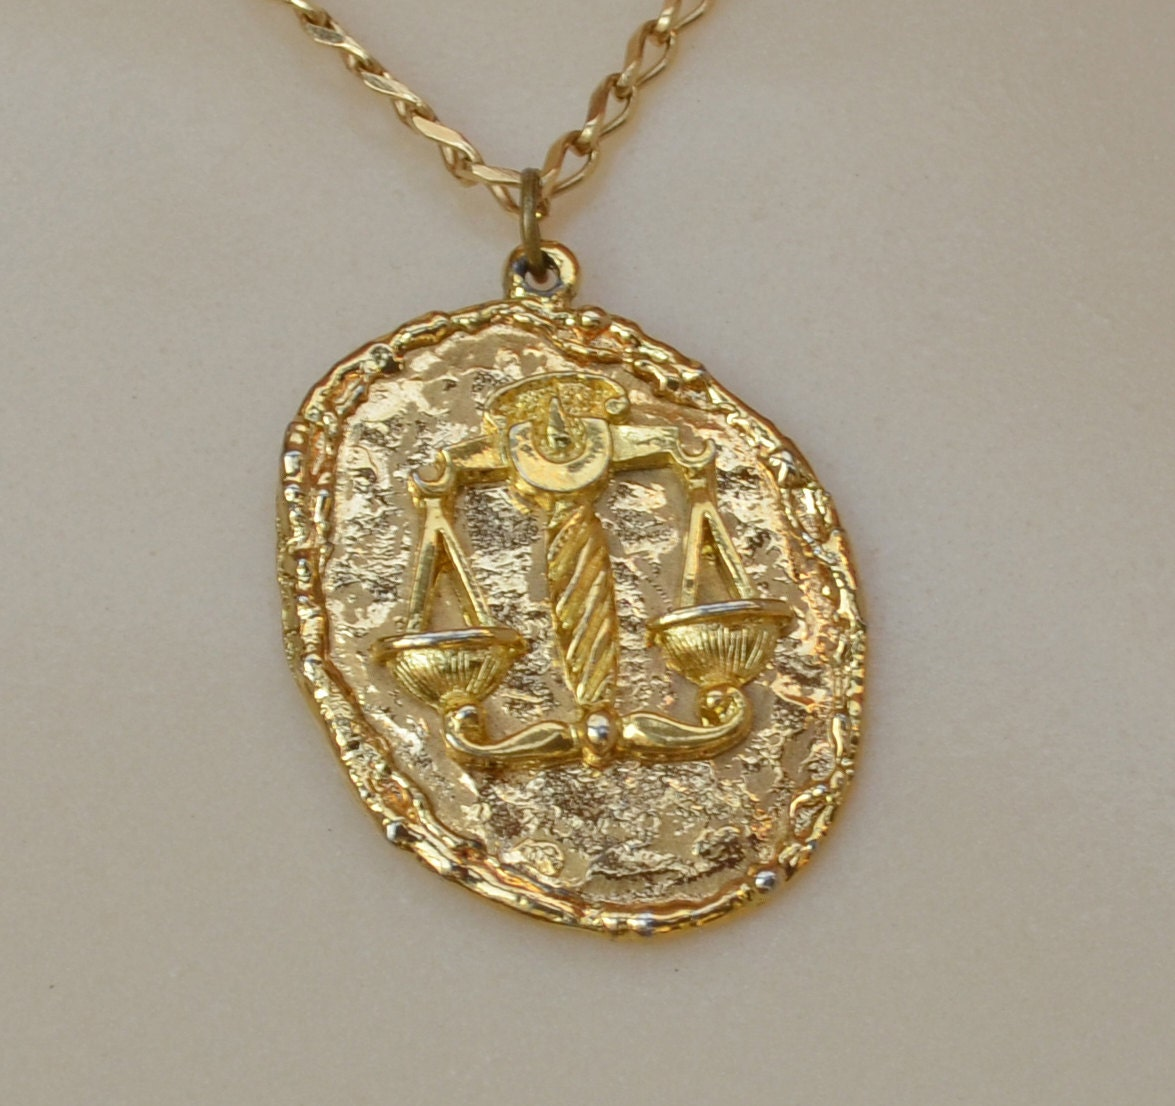 zodiac 1970s libra pendant necklace gold nugget texture